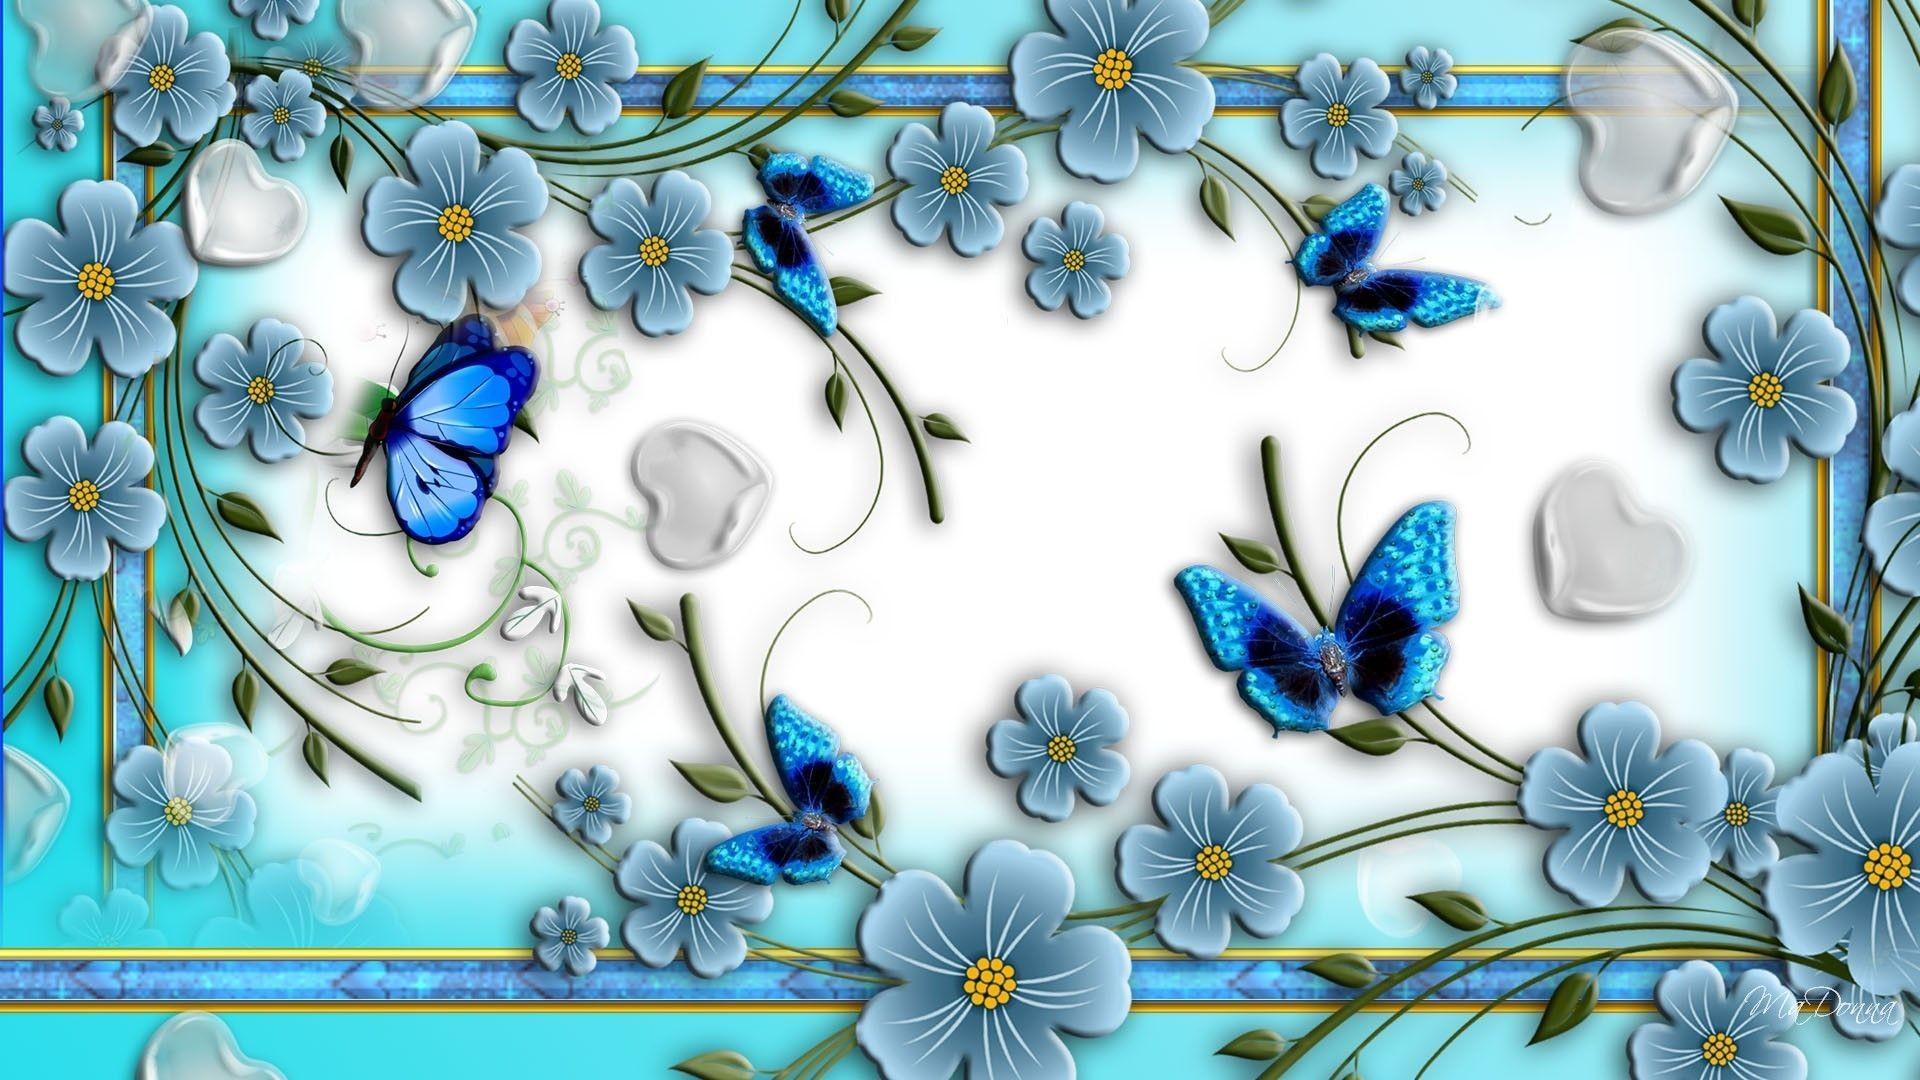 Download Blue Butterflies Abstract Flowers Unique Nature Wallpaper .